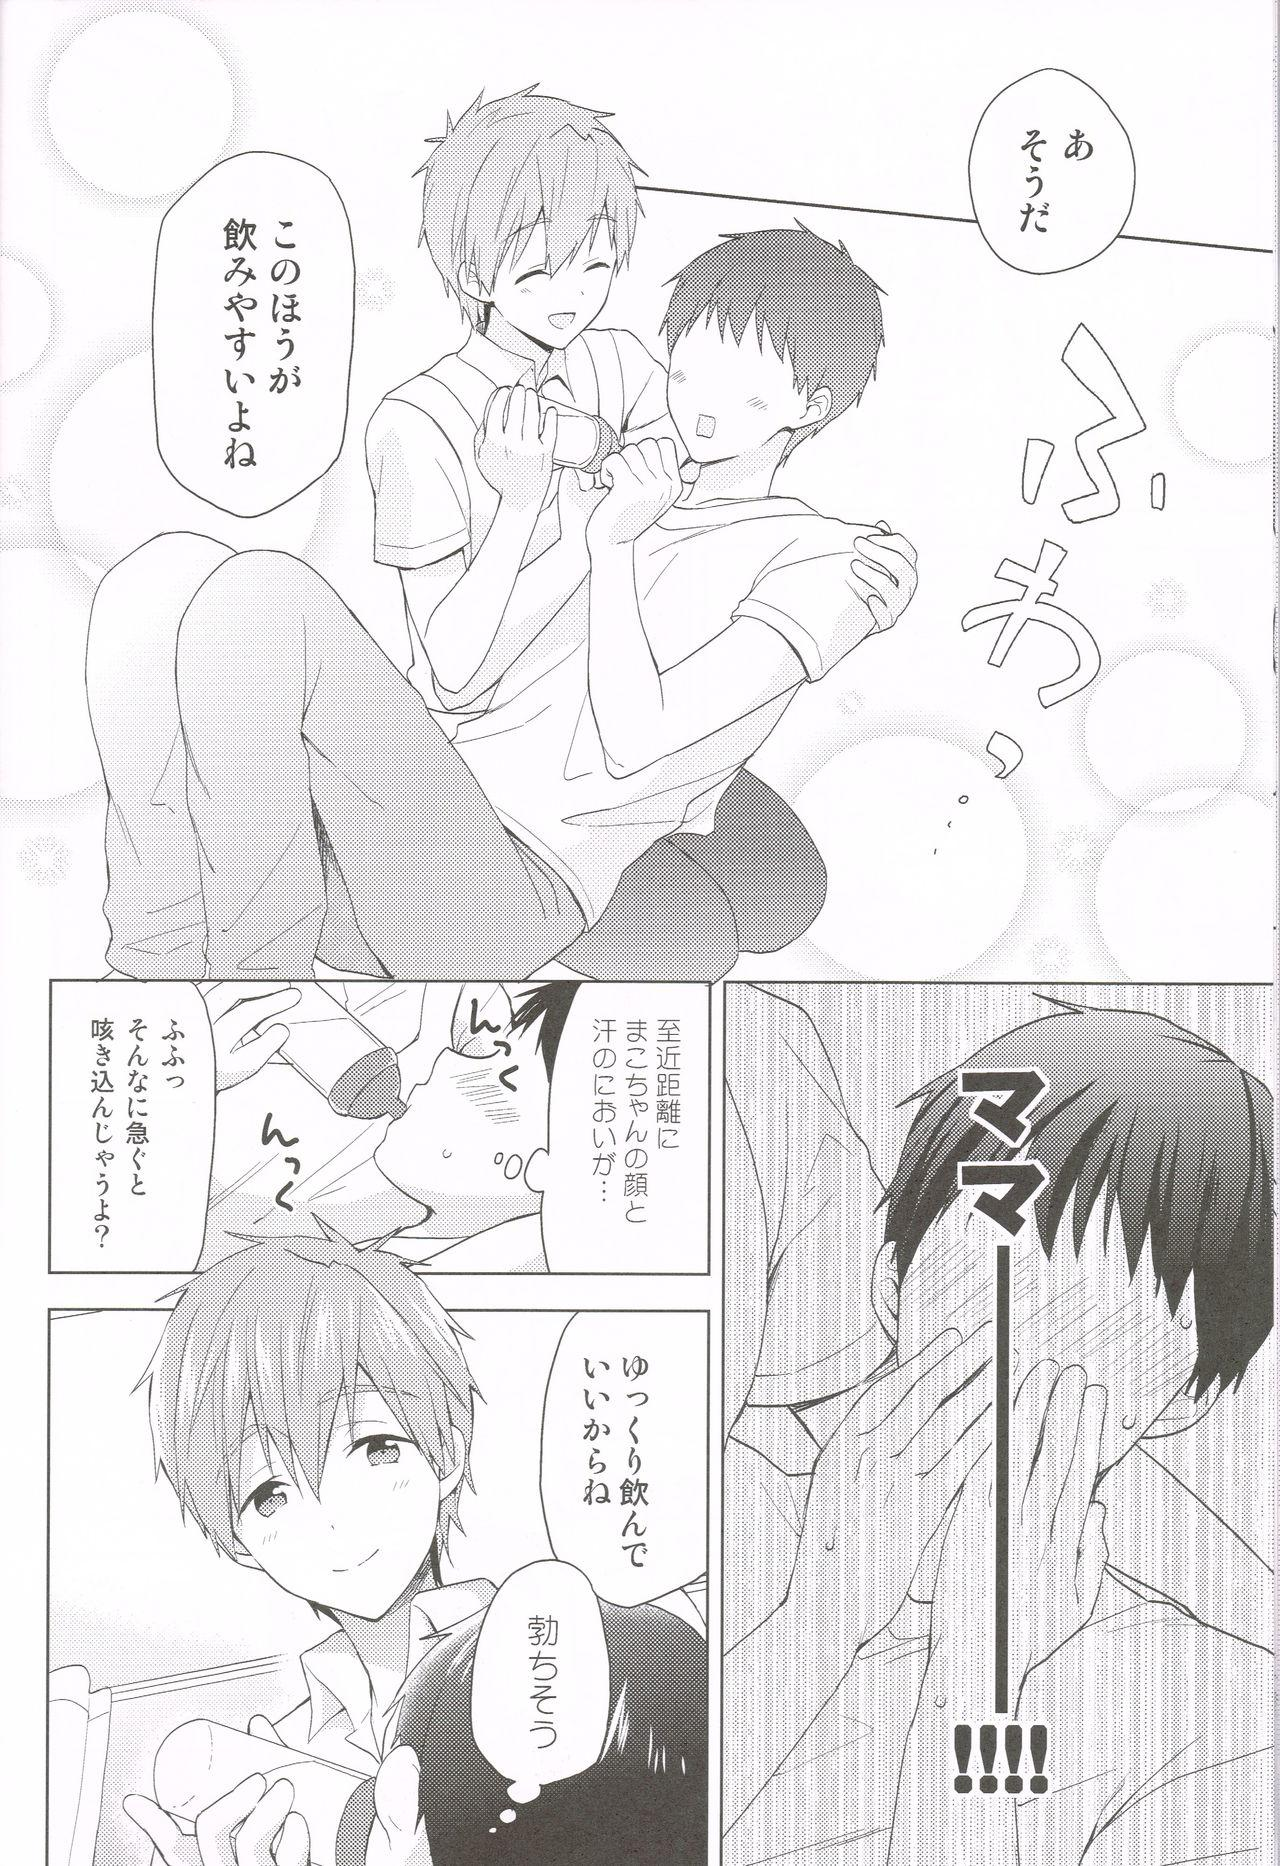 Makoto-kun to Omamagoto 6